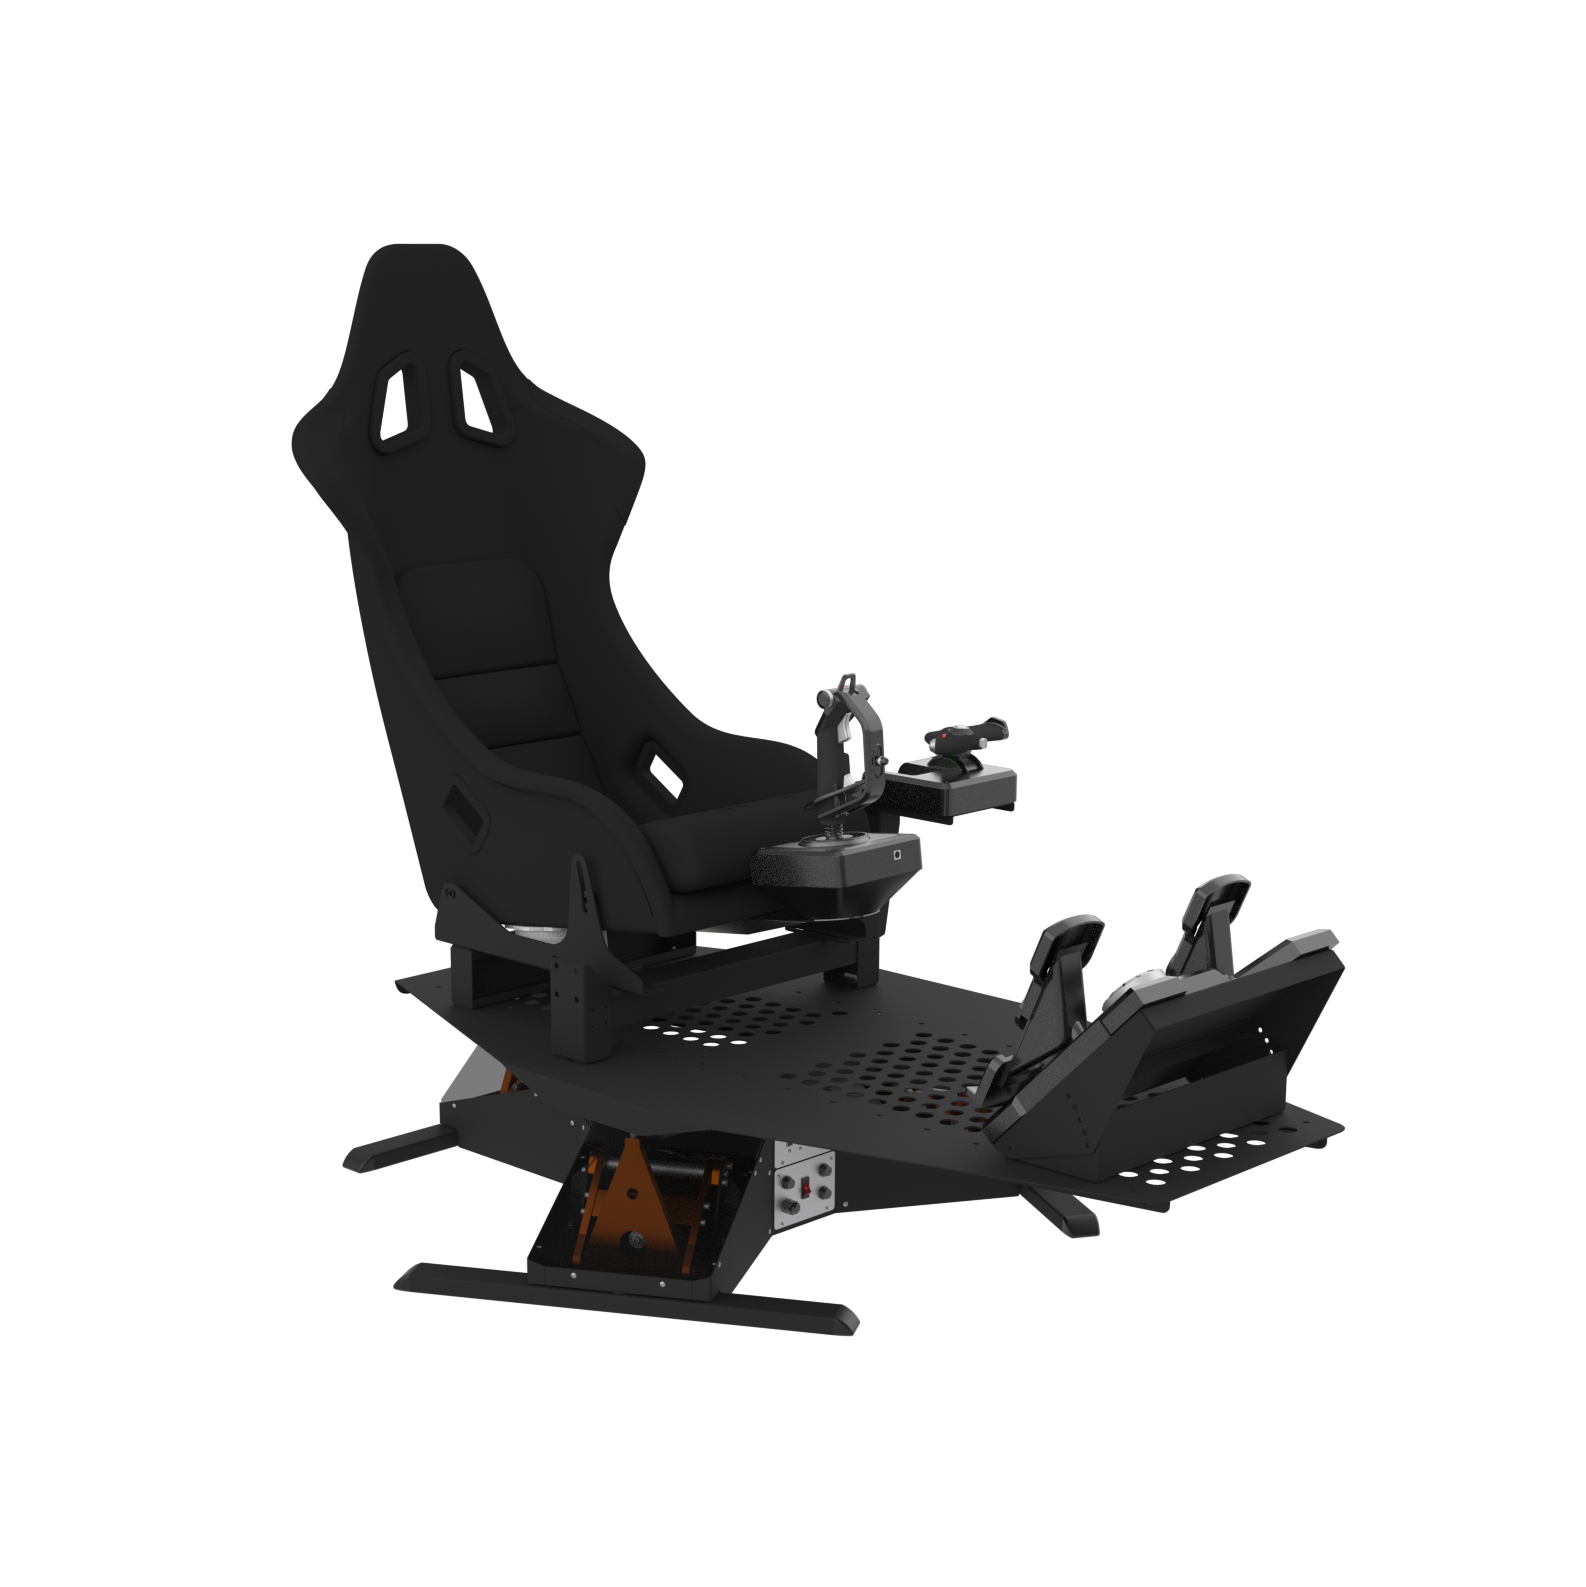 3-DoF Flight Simulator